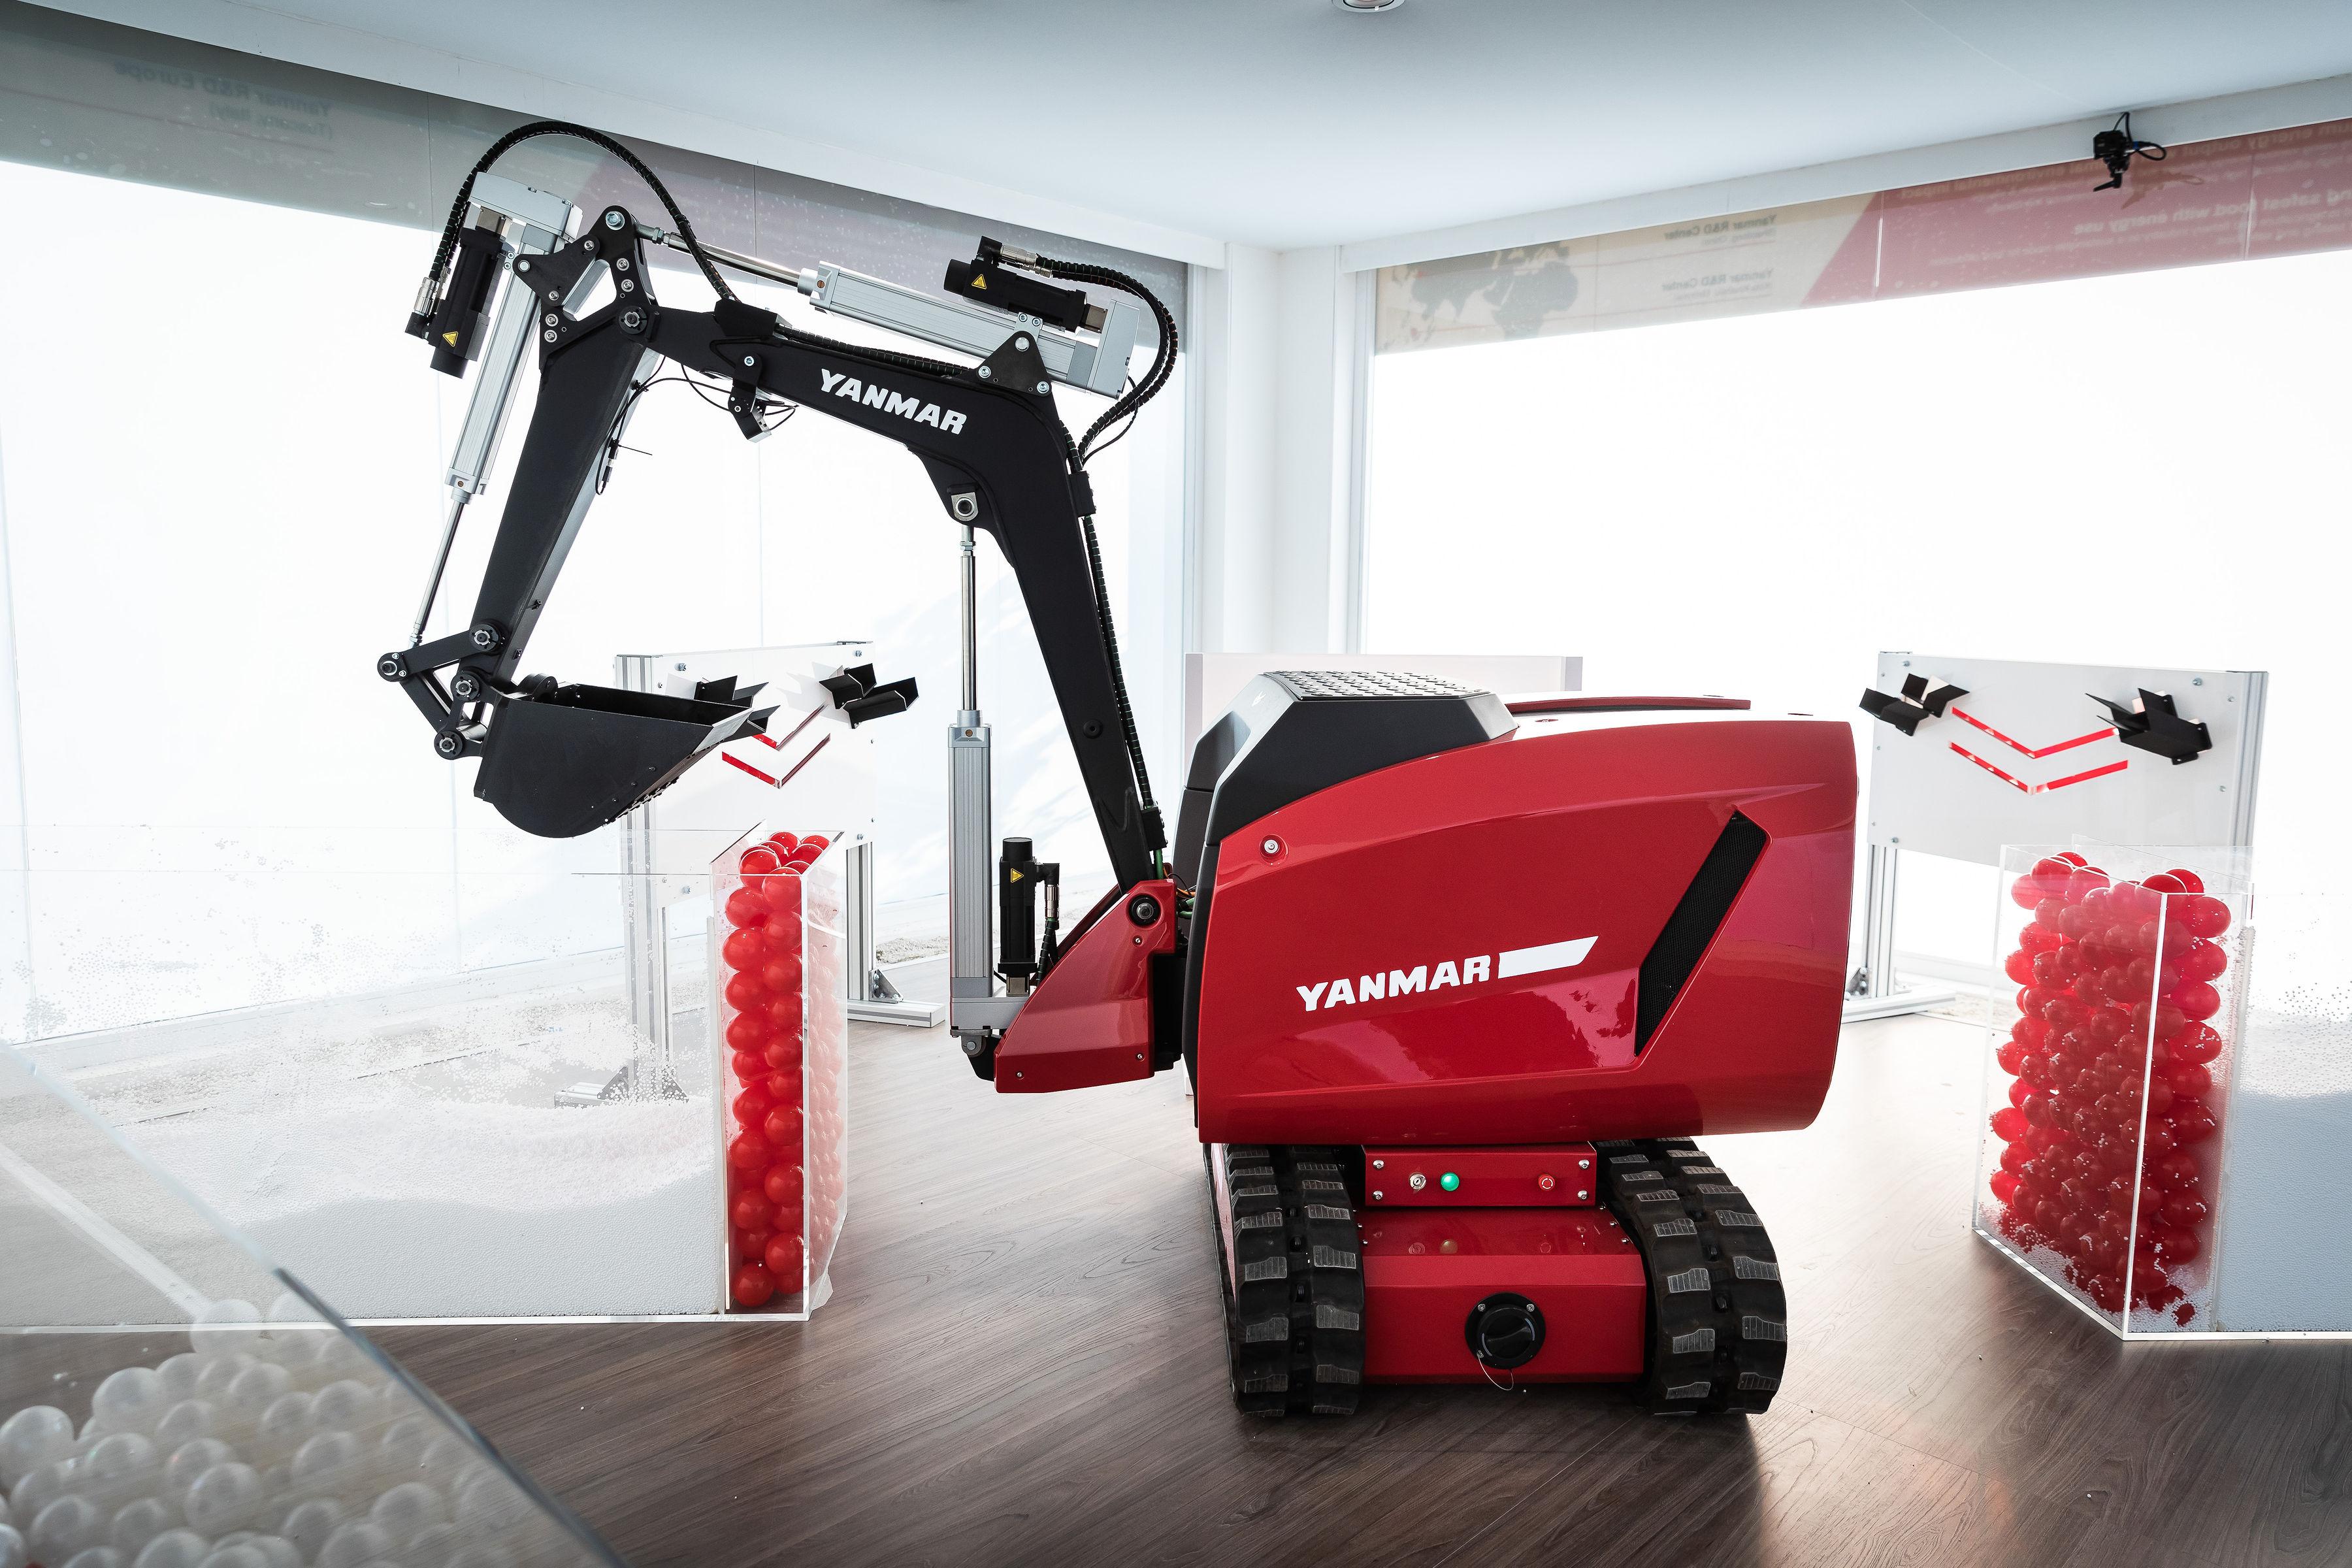 Yanmar Heavy Plant Excavator and bb Key